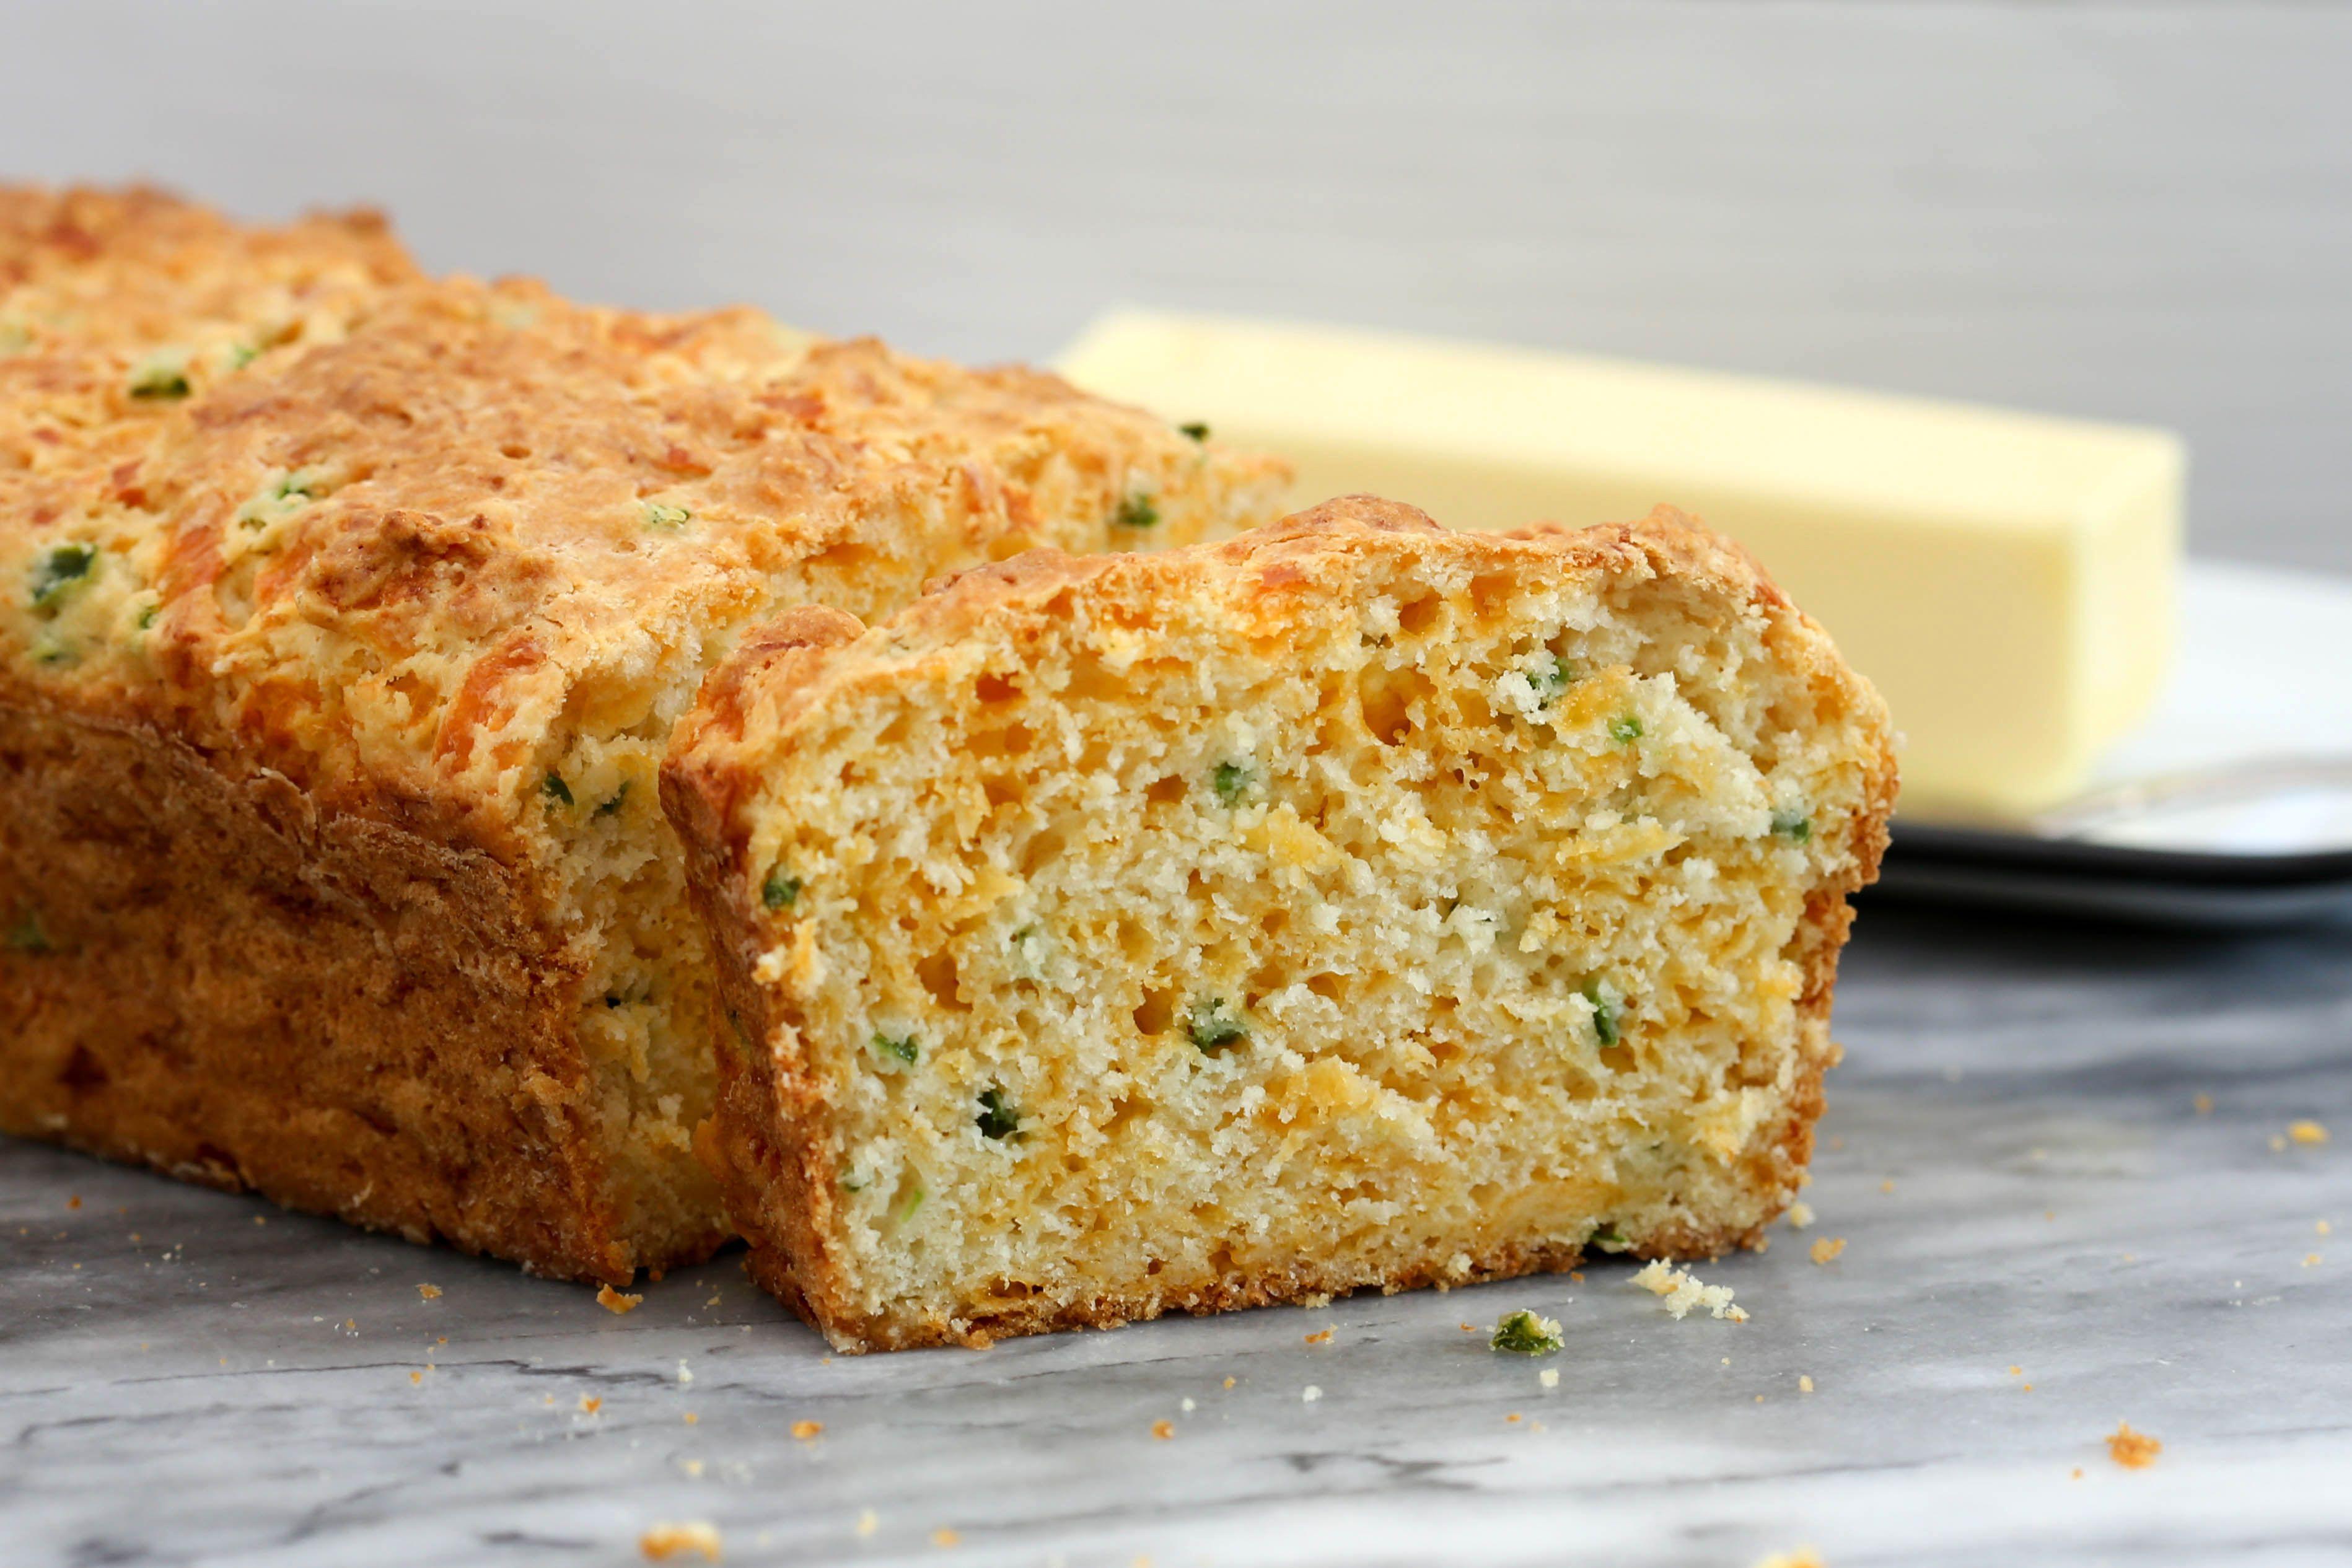 Jalapeno cheddar quick bread